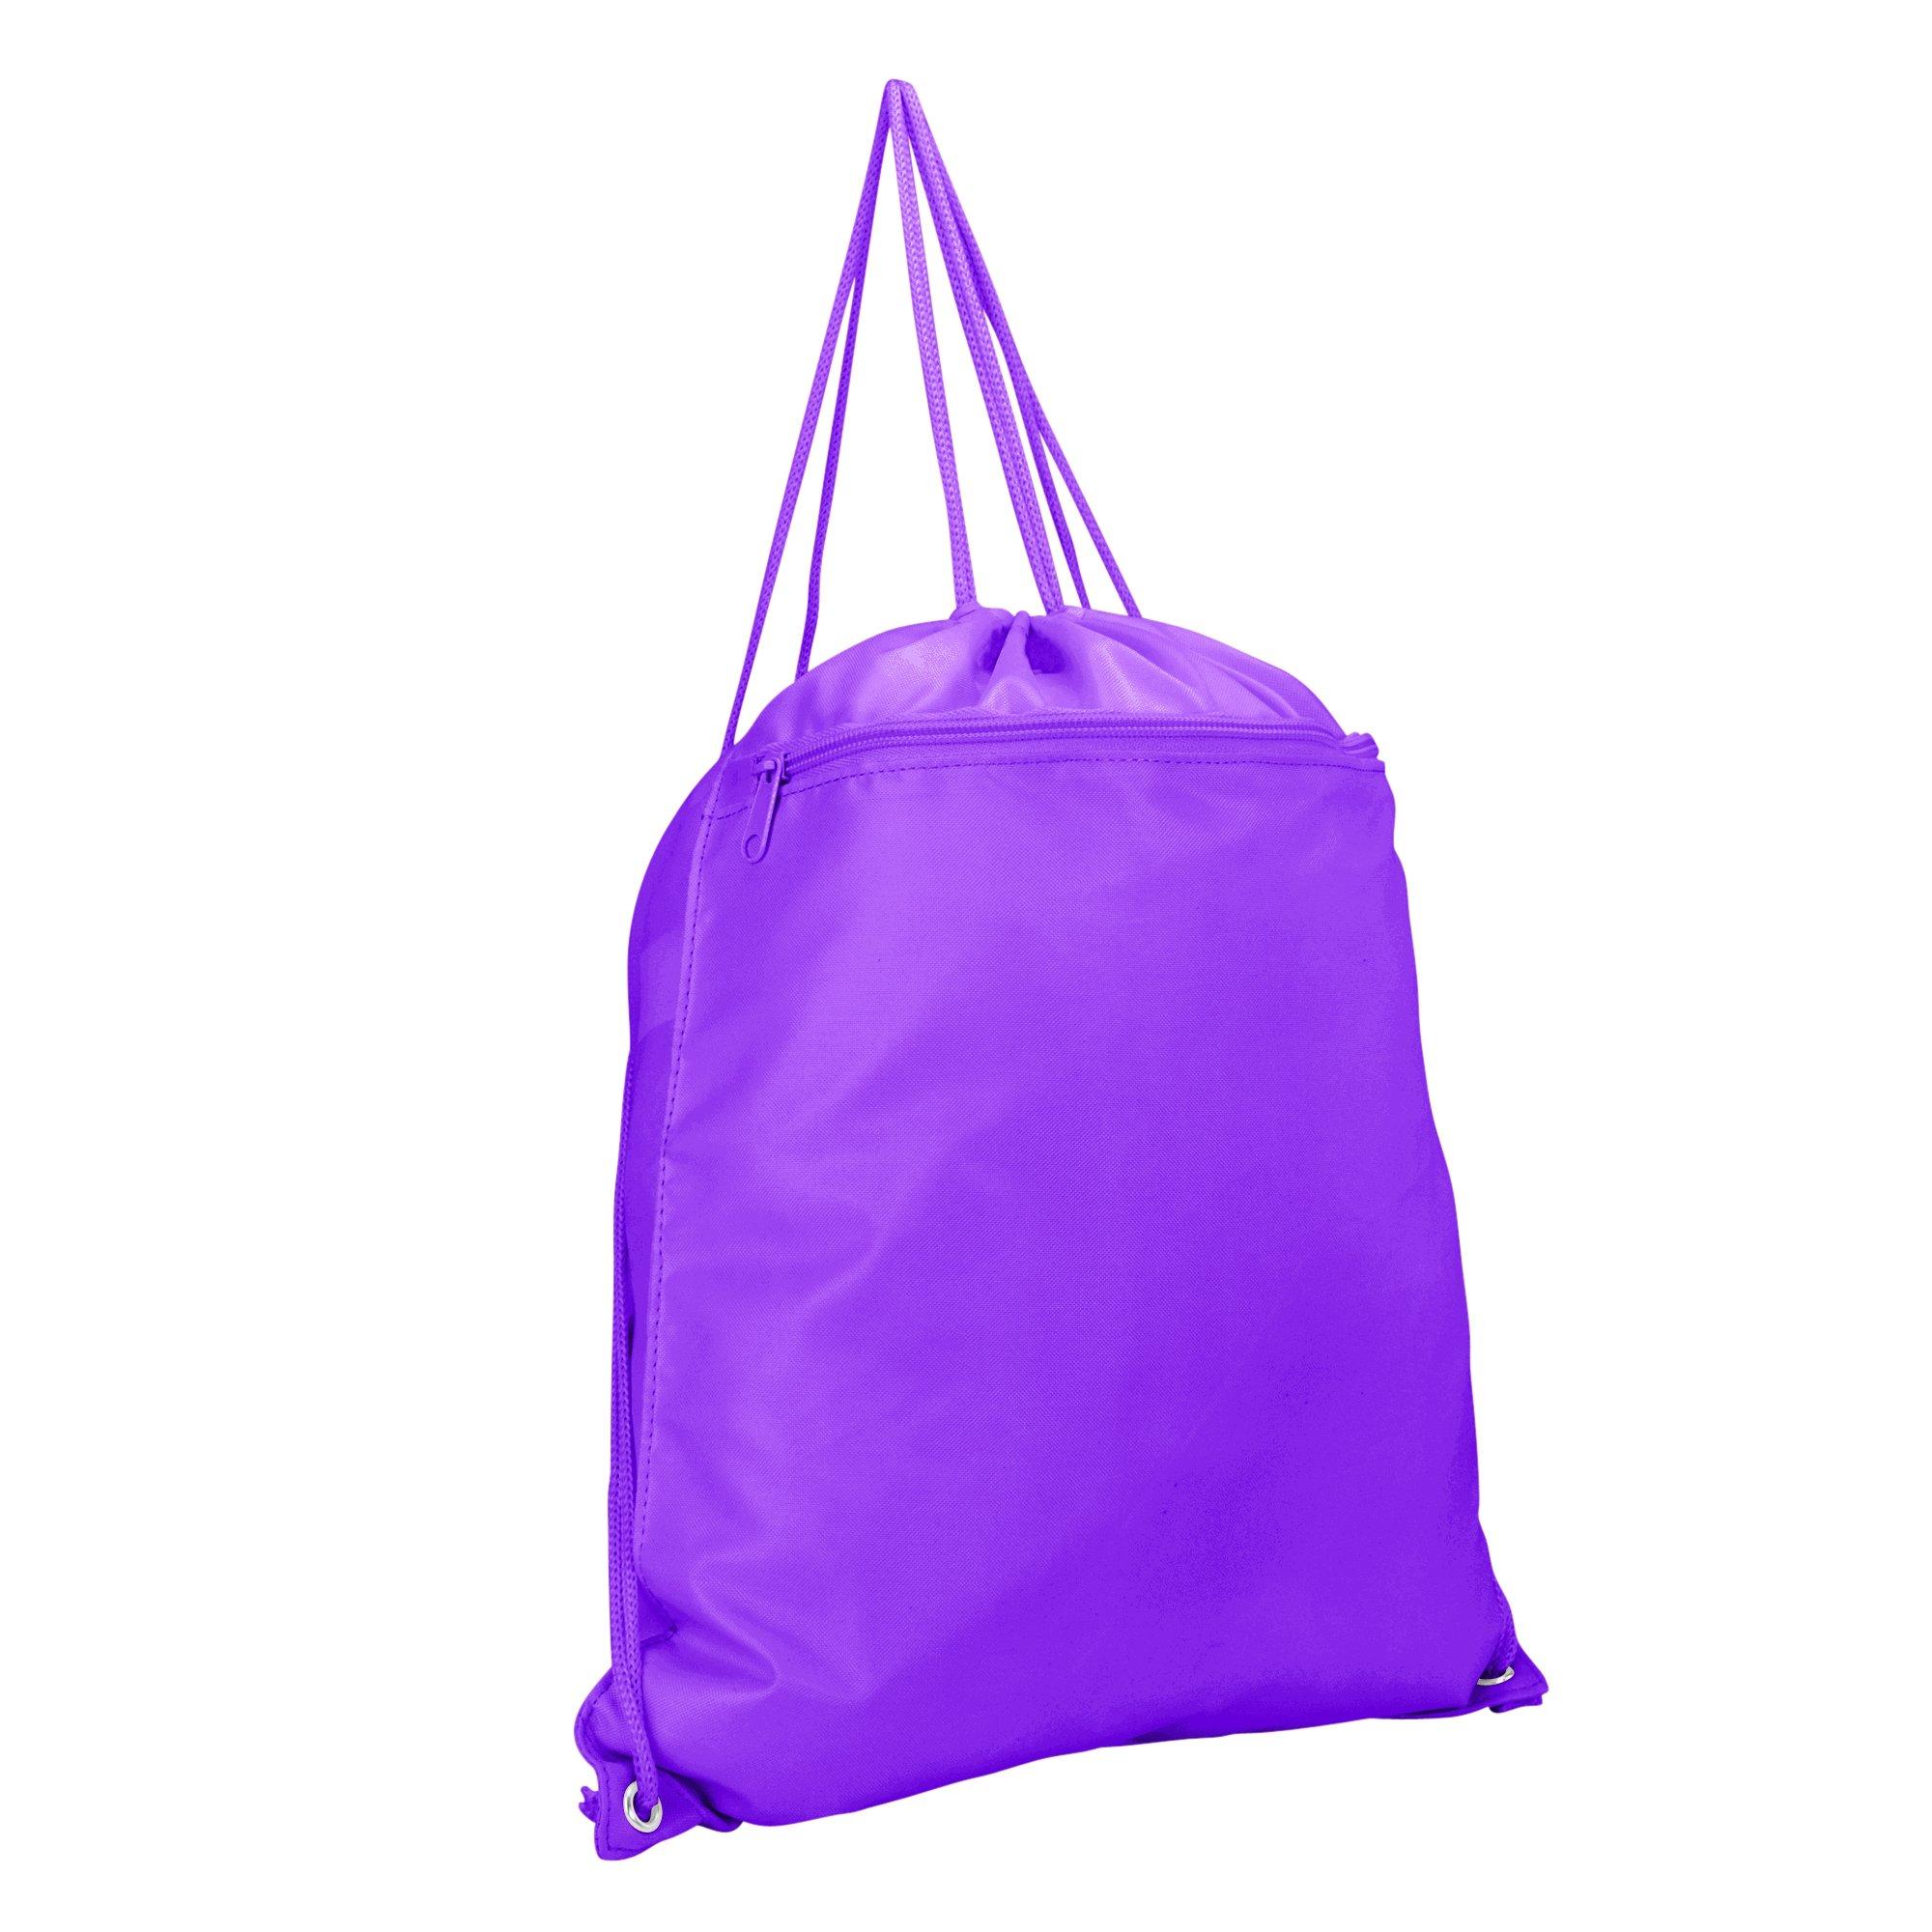 DALIX Drawstring Backpack Sack Bag in Purple